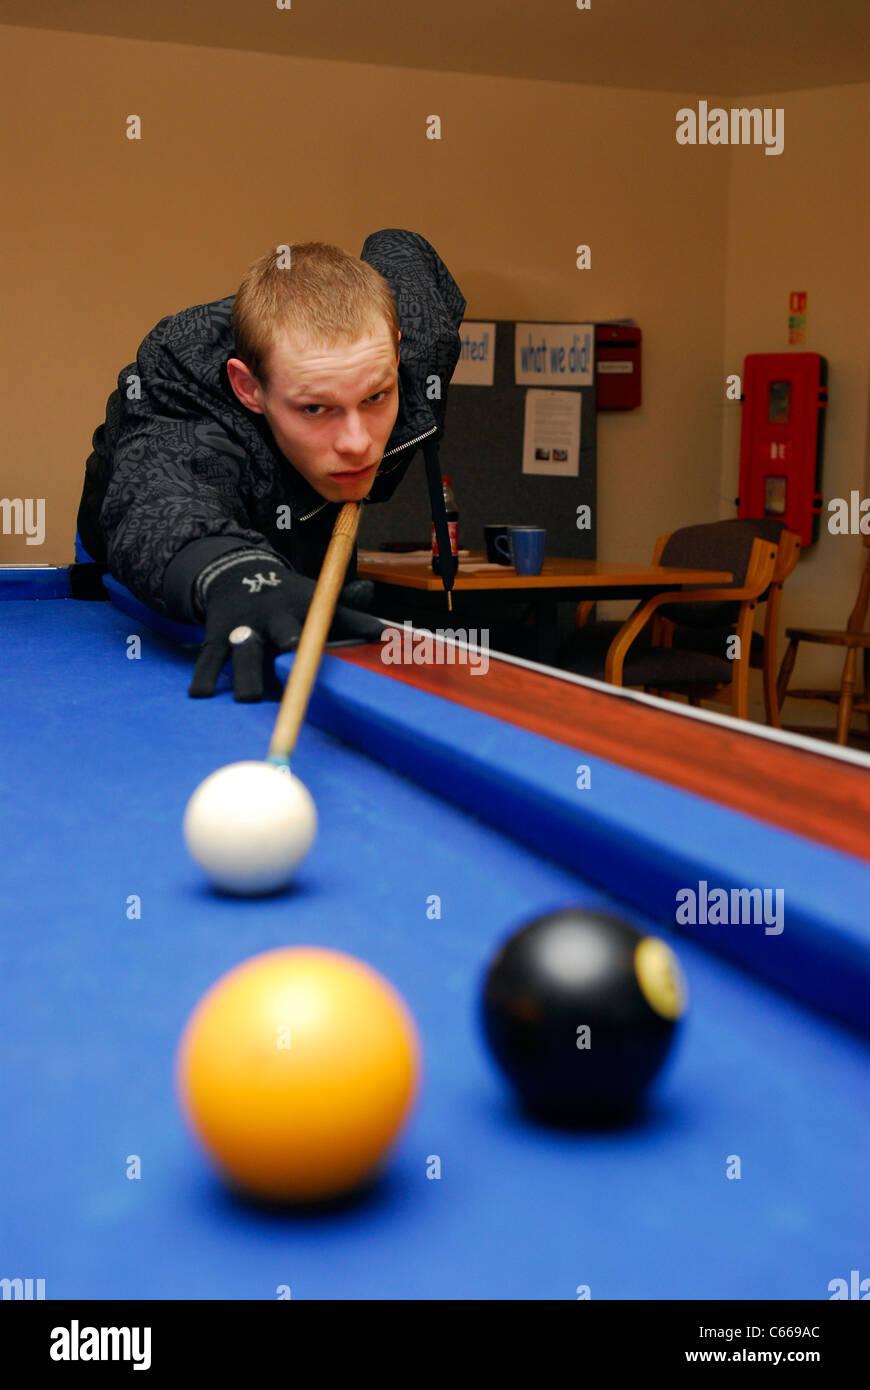 Young man playing pool, Herts, UK. - Stock Image